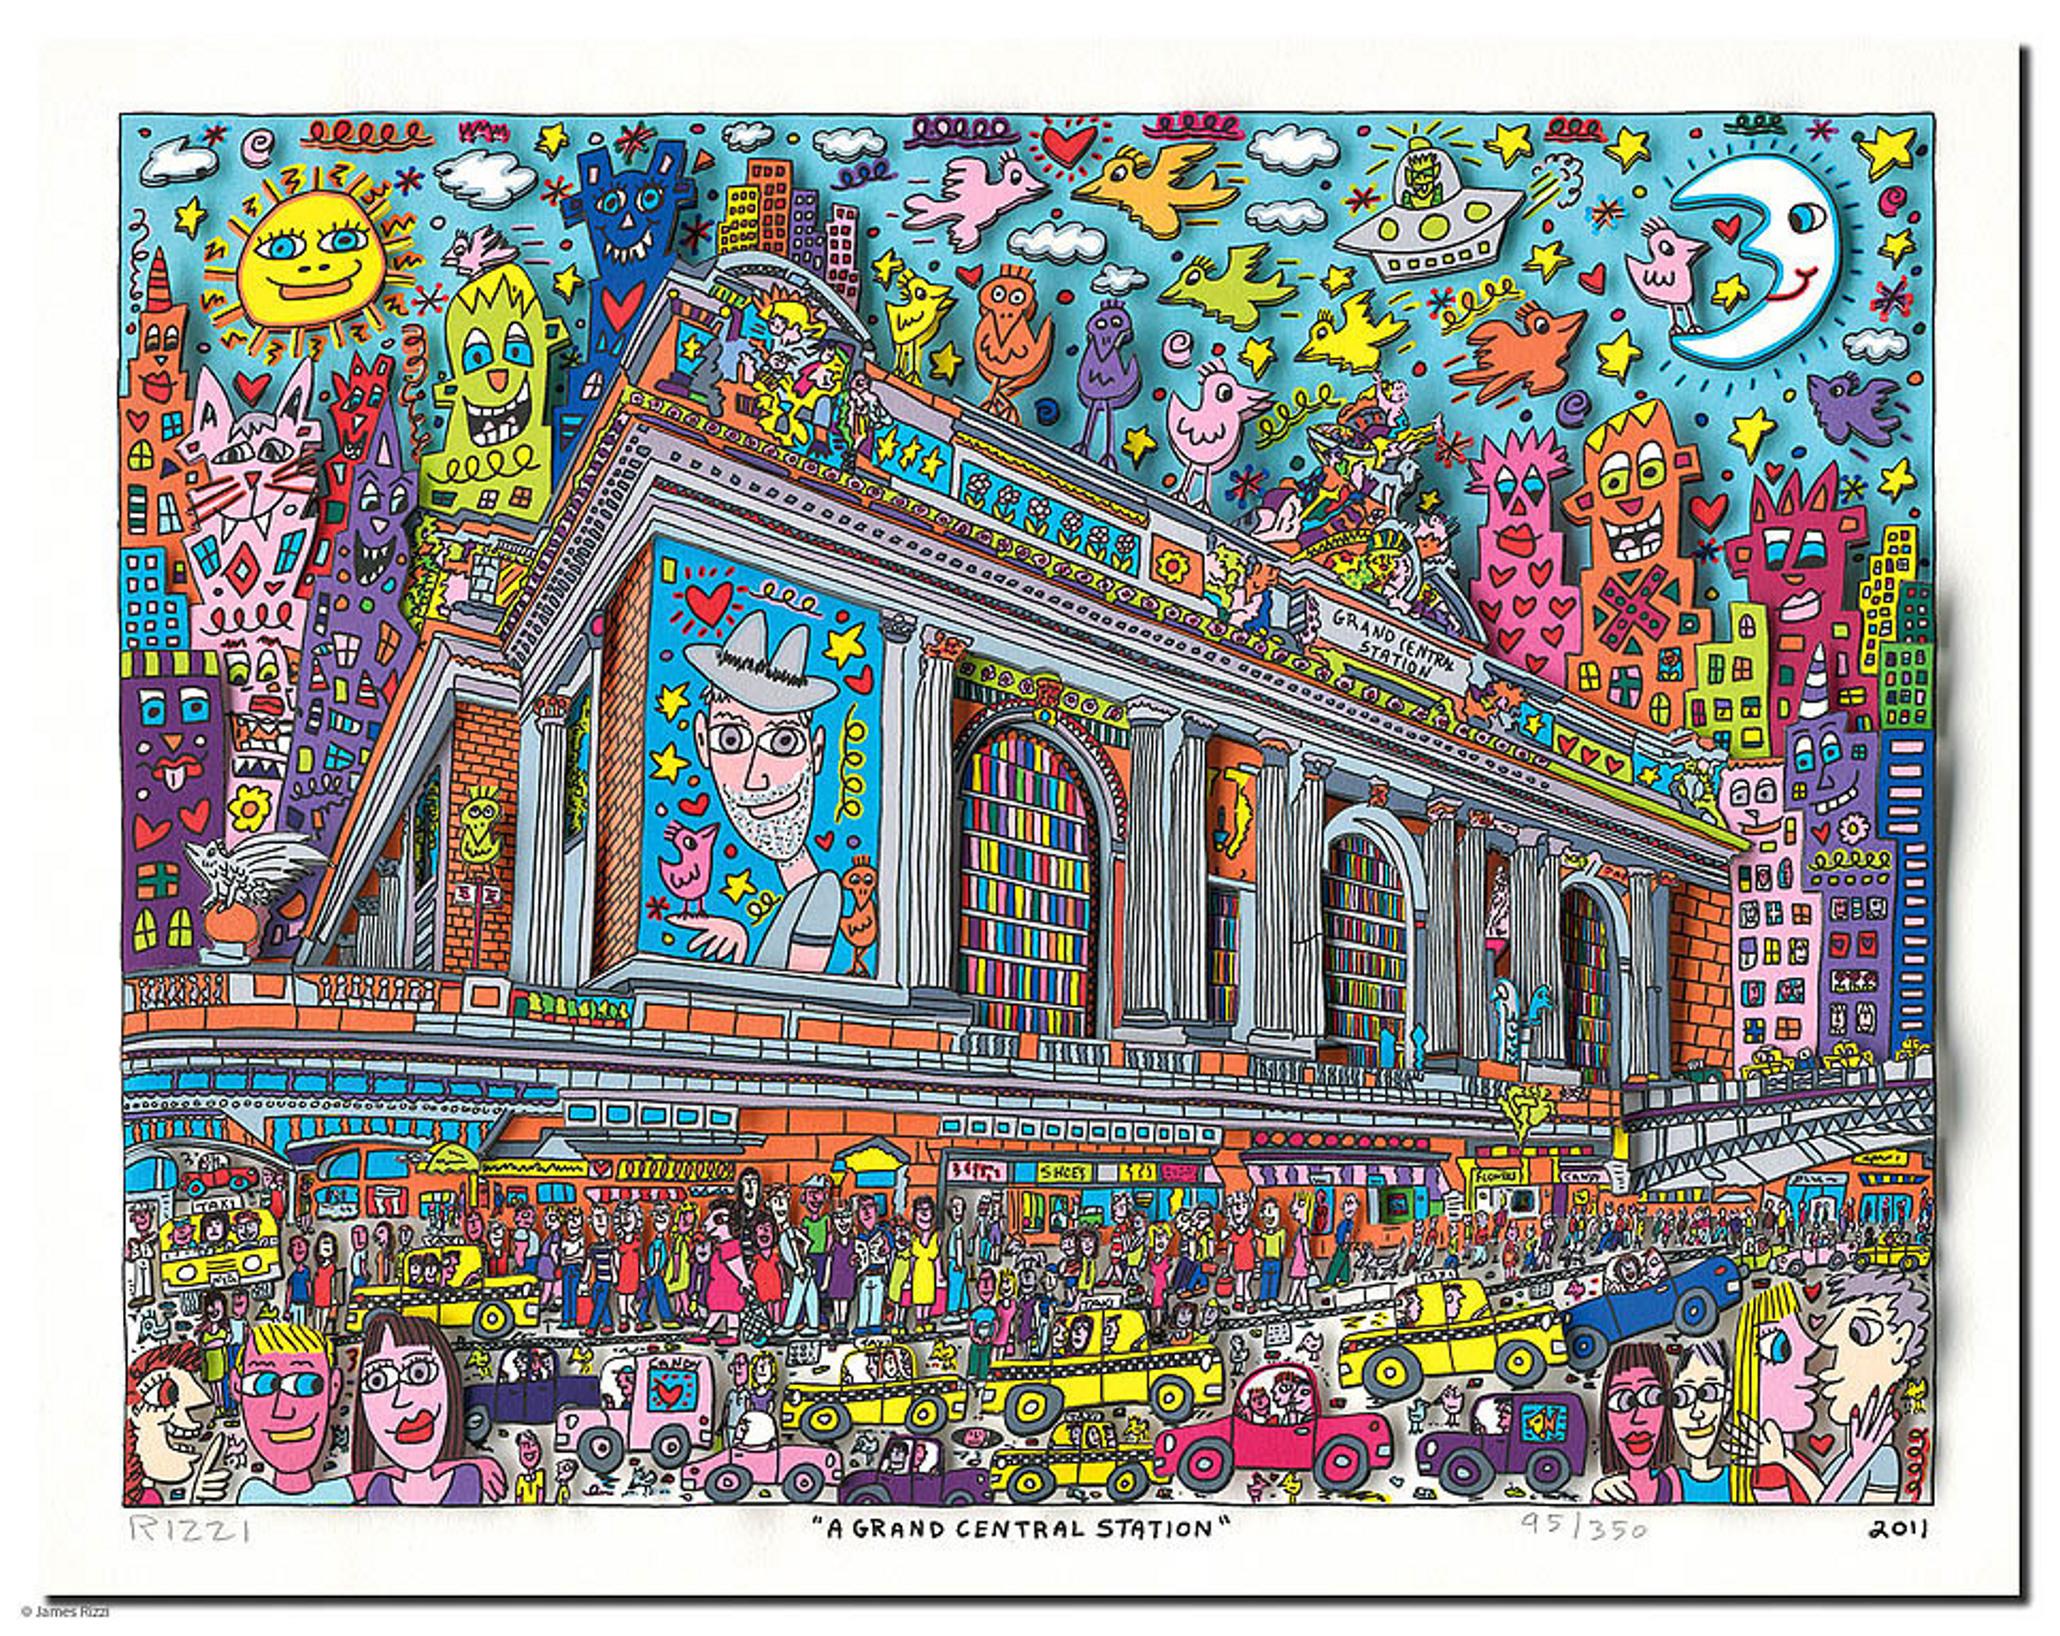 James Rizzi - Pop Art Boom ist ungebrochen | Kunst tut gut ...